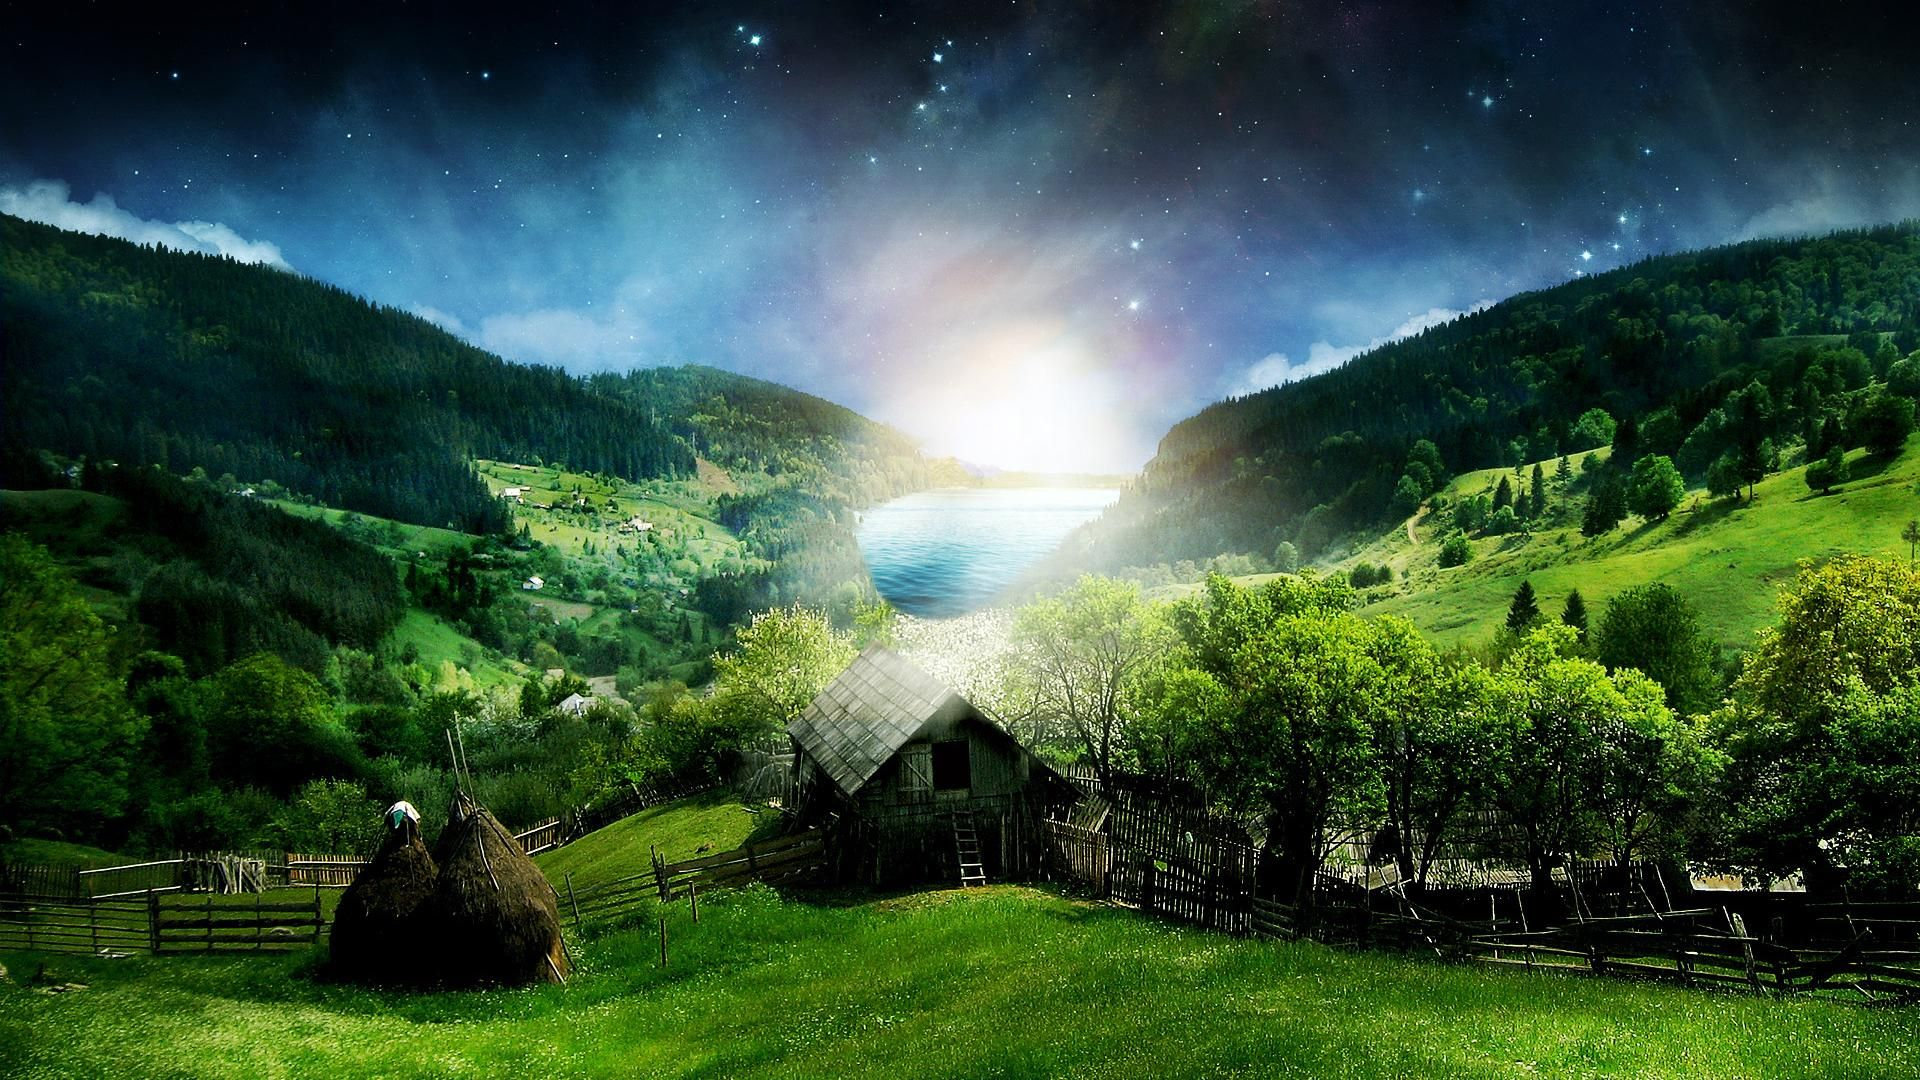 Beautiful Hd Wallpaper Free Stock Photos Download